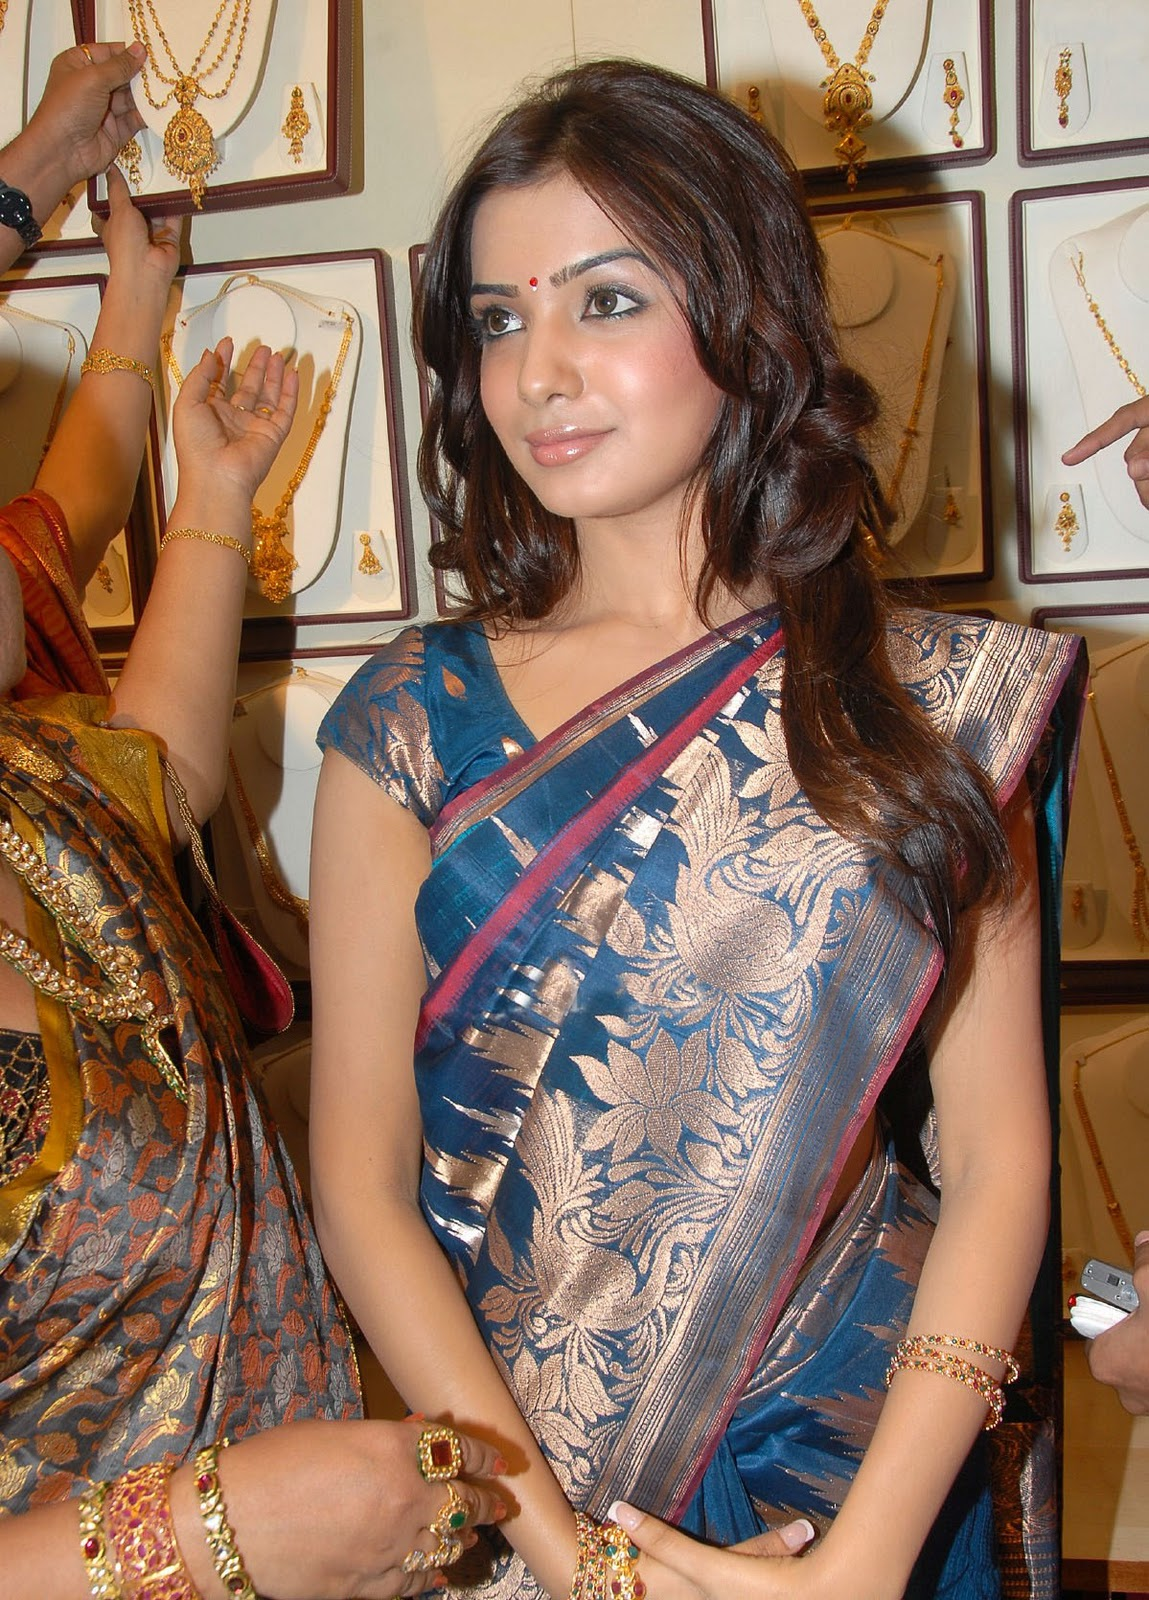 http://1.bp.blogspot.com/-fqgujqQxE8k/TbaUkidCbqI/AAAAAAAARPI/zN2J80fhJfc/s1600/samantha-ruth-prabhu-at-rks-silks-showroom-launch%2B%252810%2529.jpg